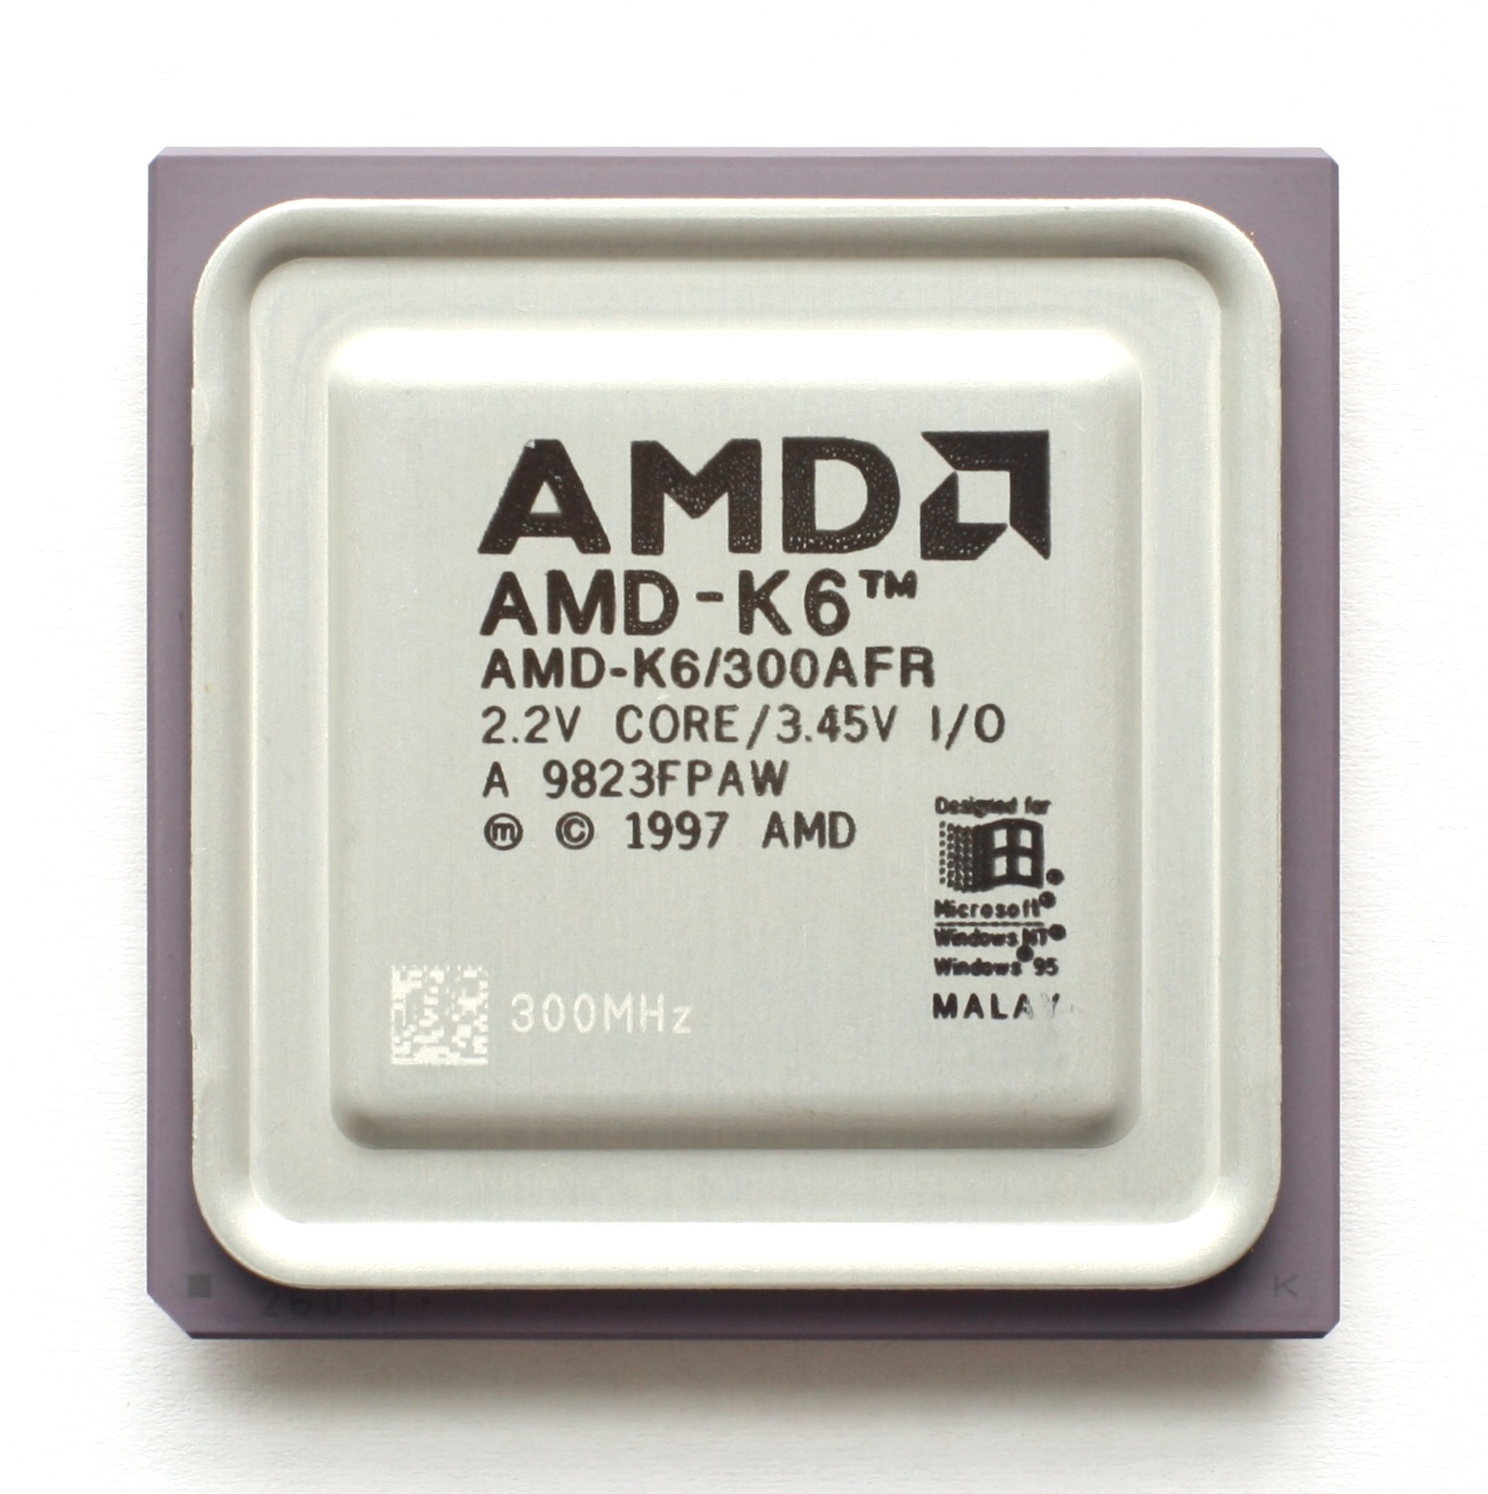 KL_AMD_K6_LittleFoot.jpg